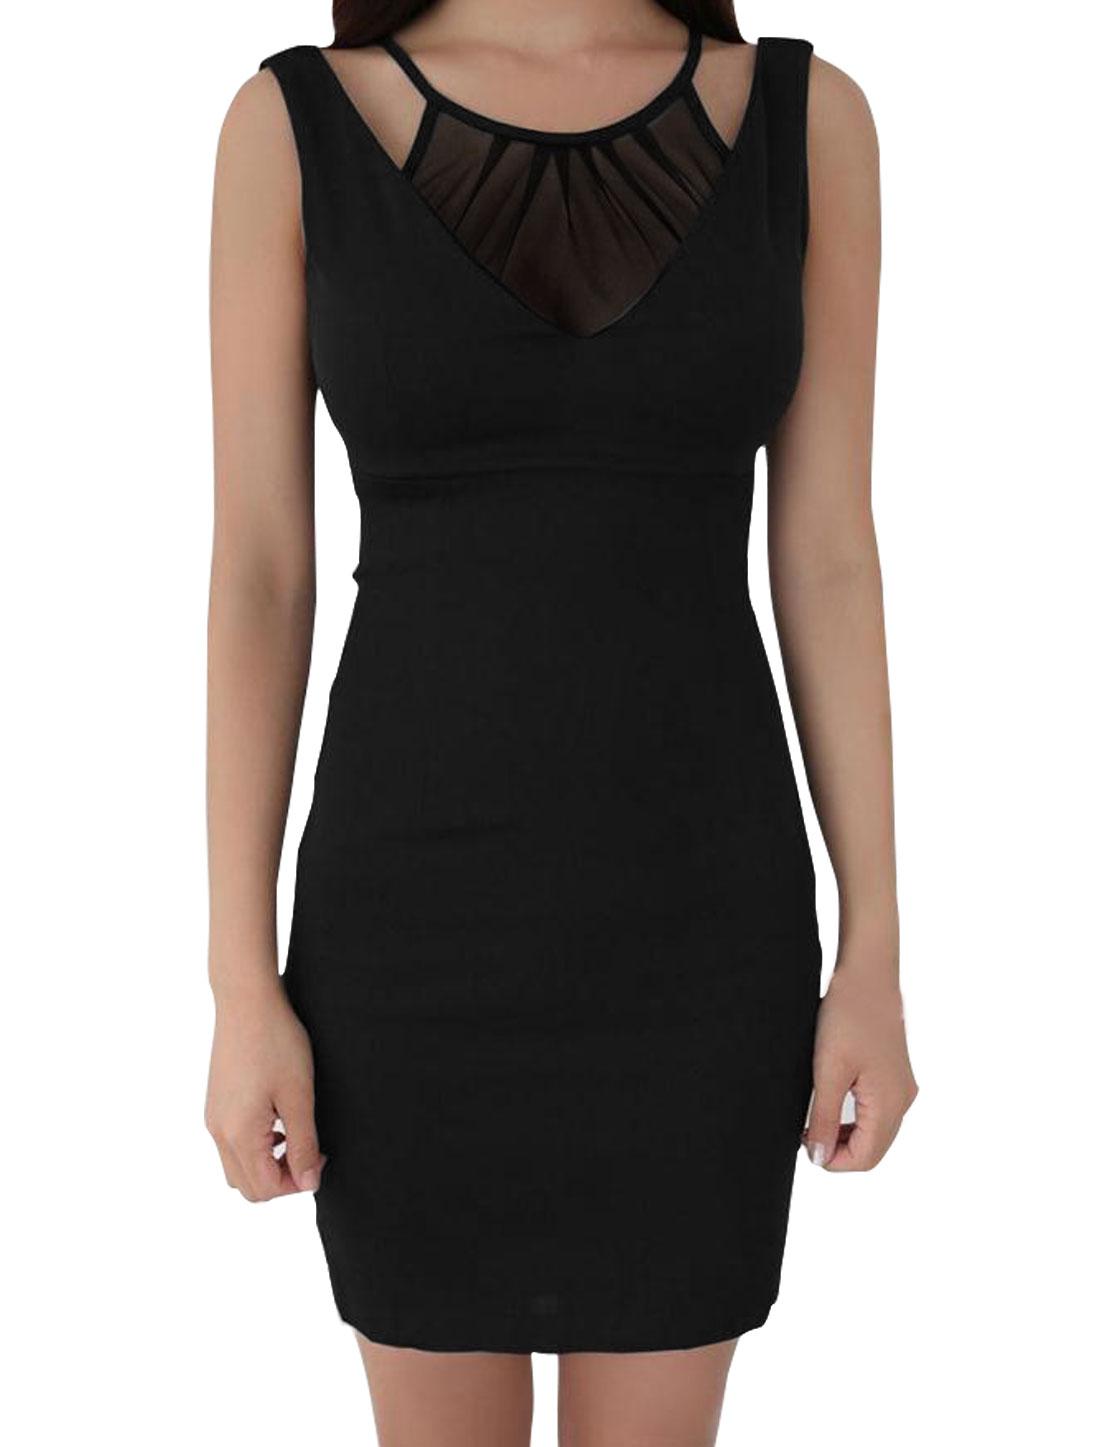 Woman Sleeveless Layered Semi Sheer Upper Bodycon Dress Black M